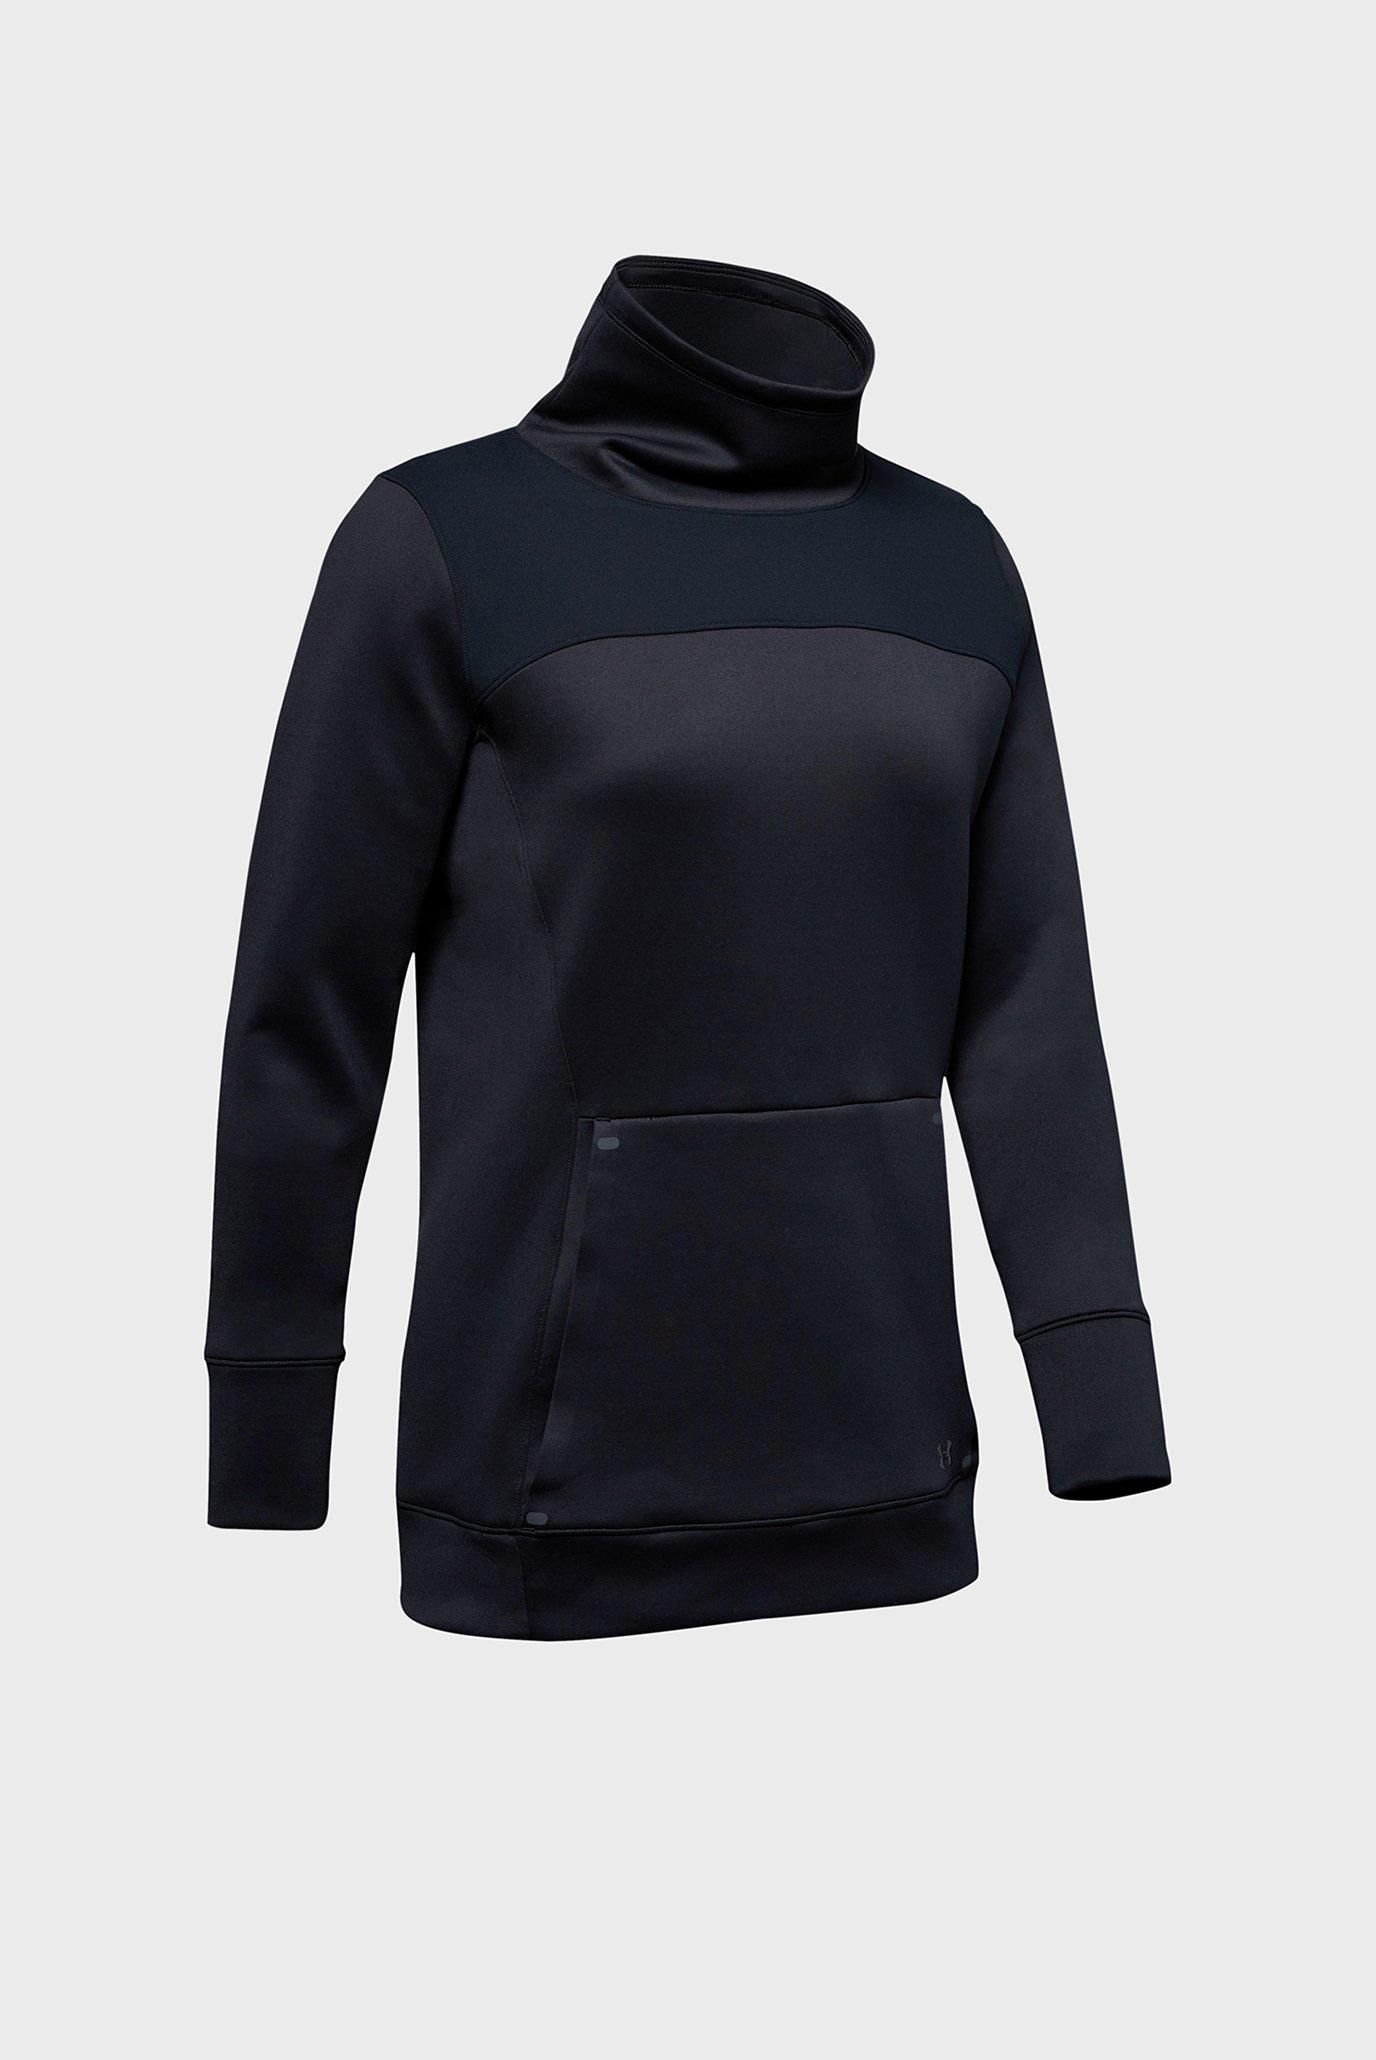 Женская черная спортивная кофта UA CG Armour Hybrid Pullover-BLK Under Armour